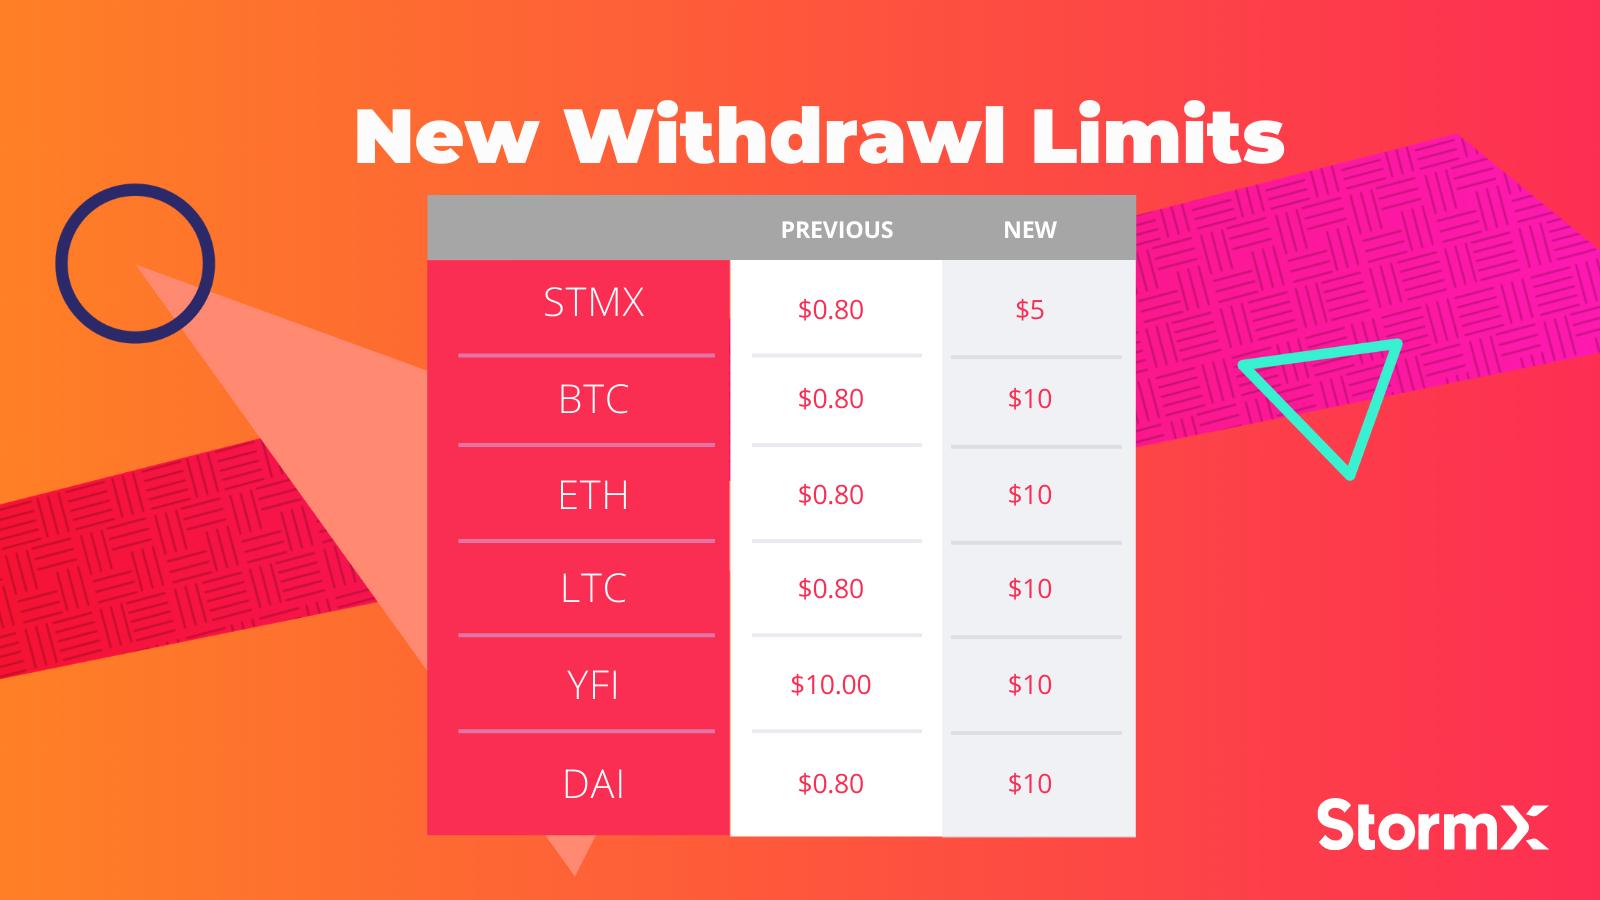 New Withdrawl Limits